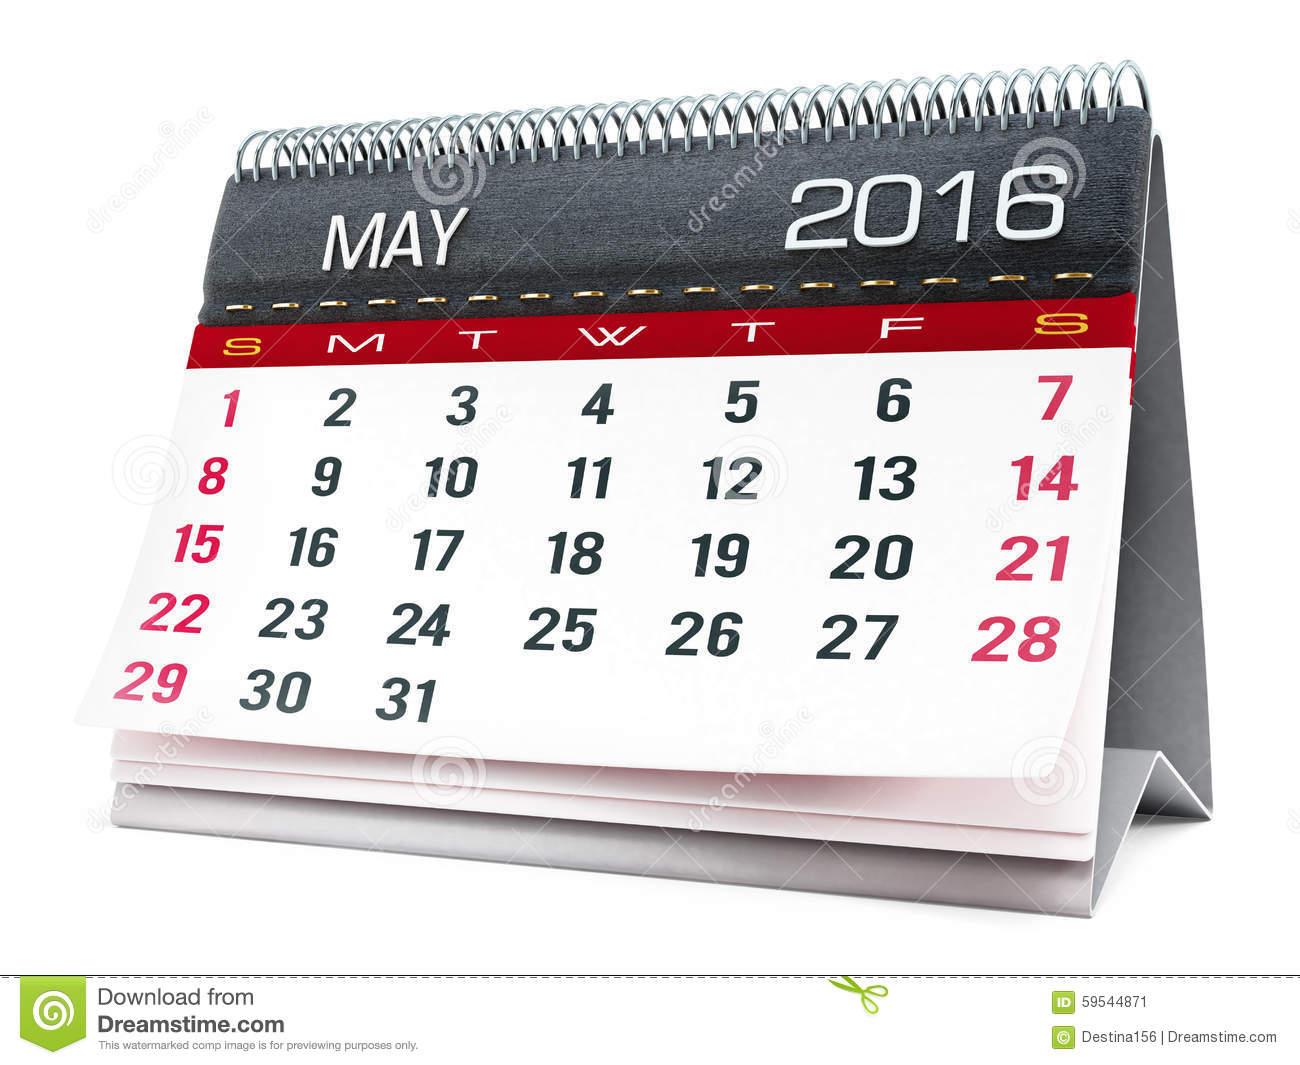 May 2016 calendar clipart png download May 2016 Desktop Calendar Stock Illustration - Image: 59544871 png download